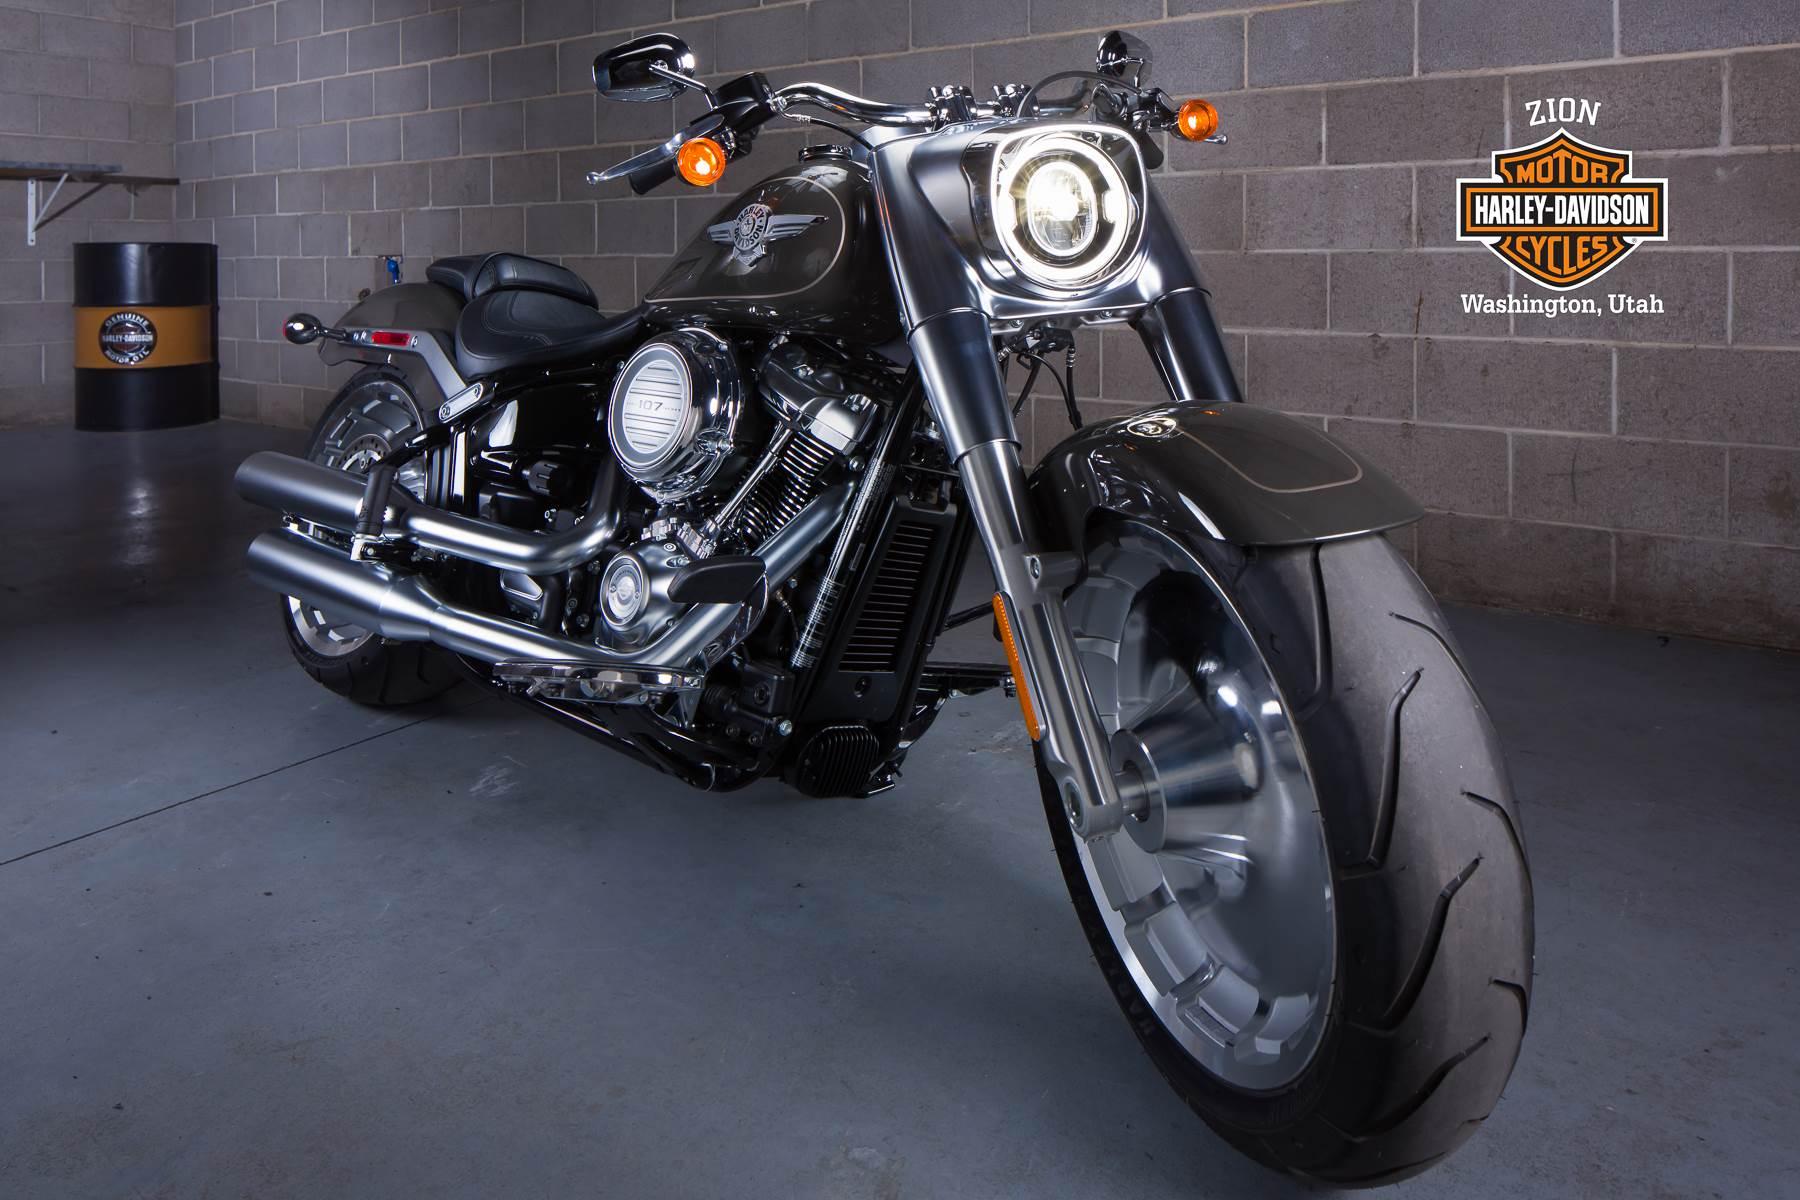 New 2018 Harley-Davidson Fat Boy®107 Motorcycles in Washington, UT